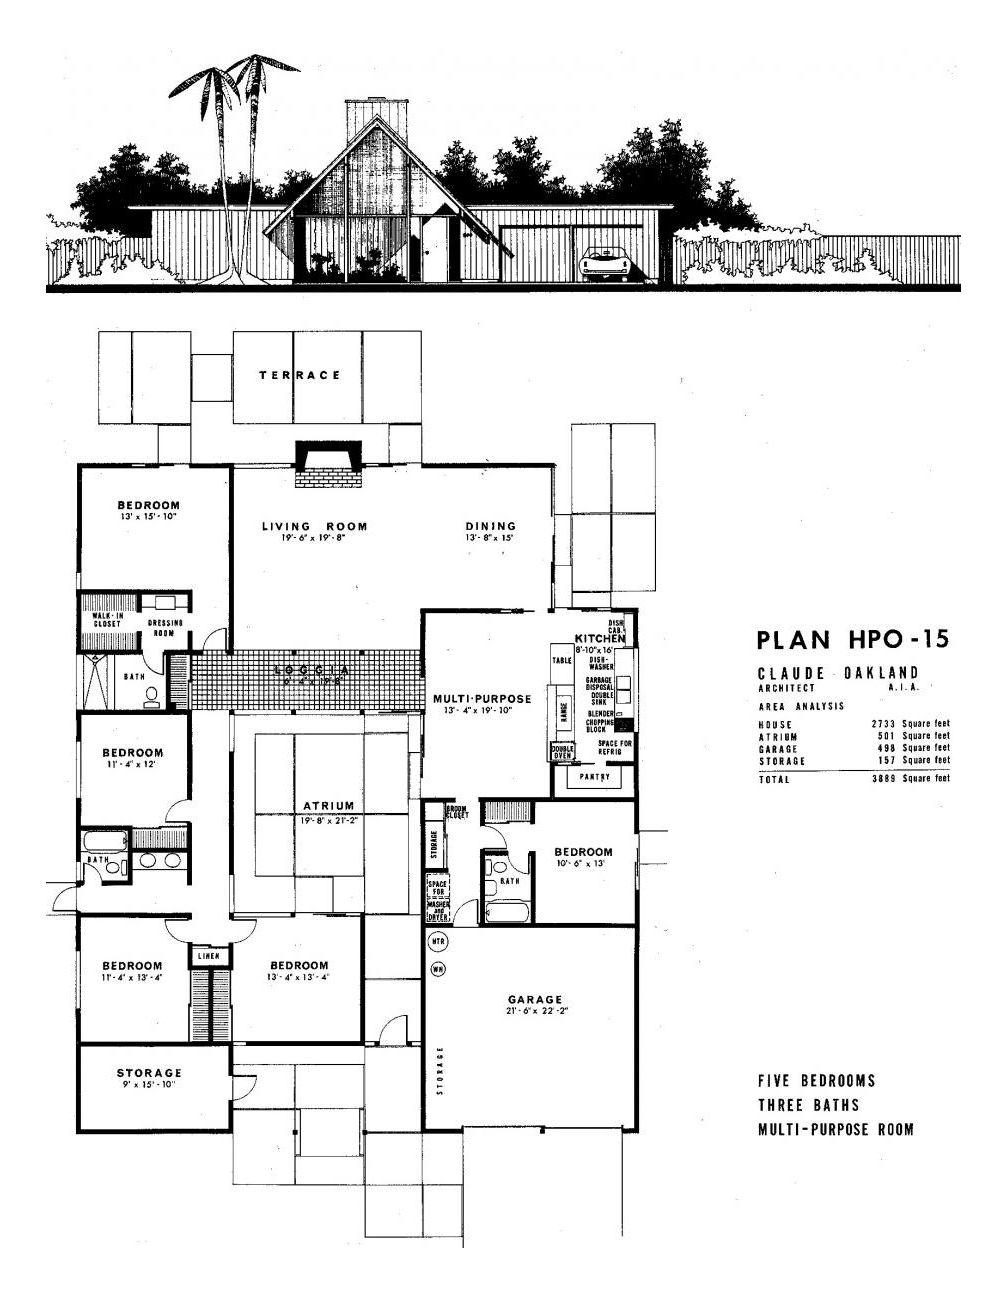 Dc Hillier S Mcm Daily The Art Of The Eichler Eichler House Plans House Floor Plans Vintage House Plans